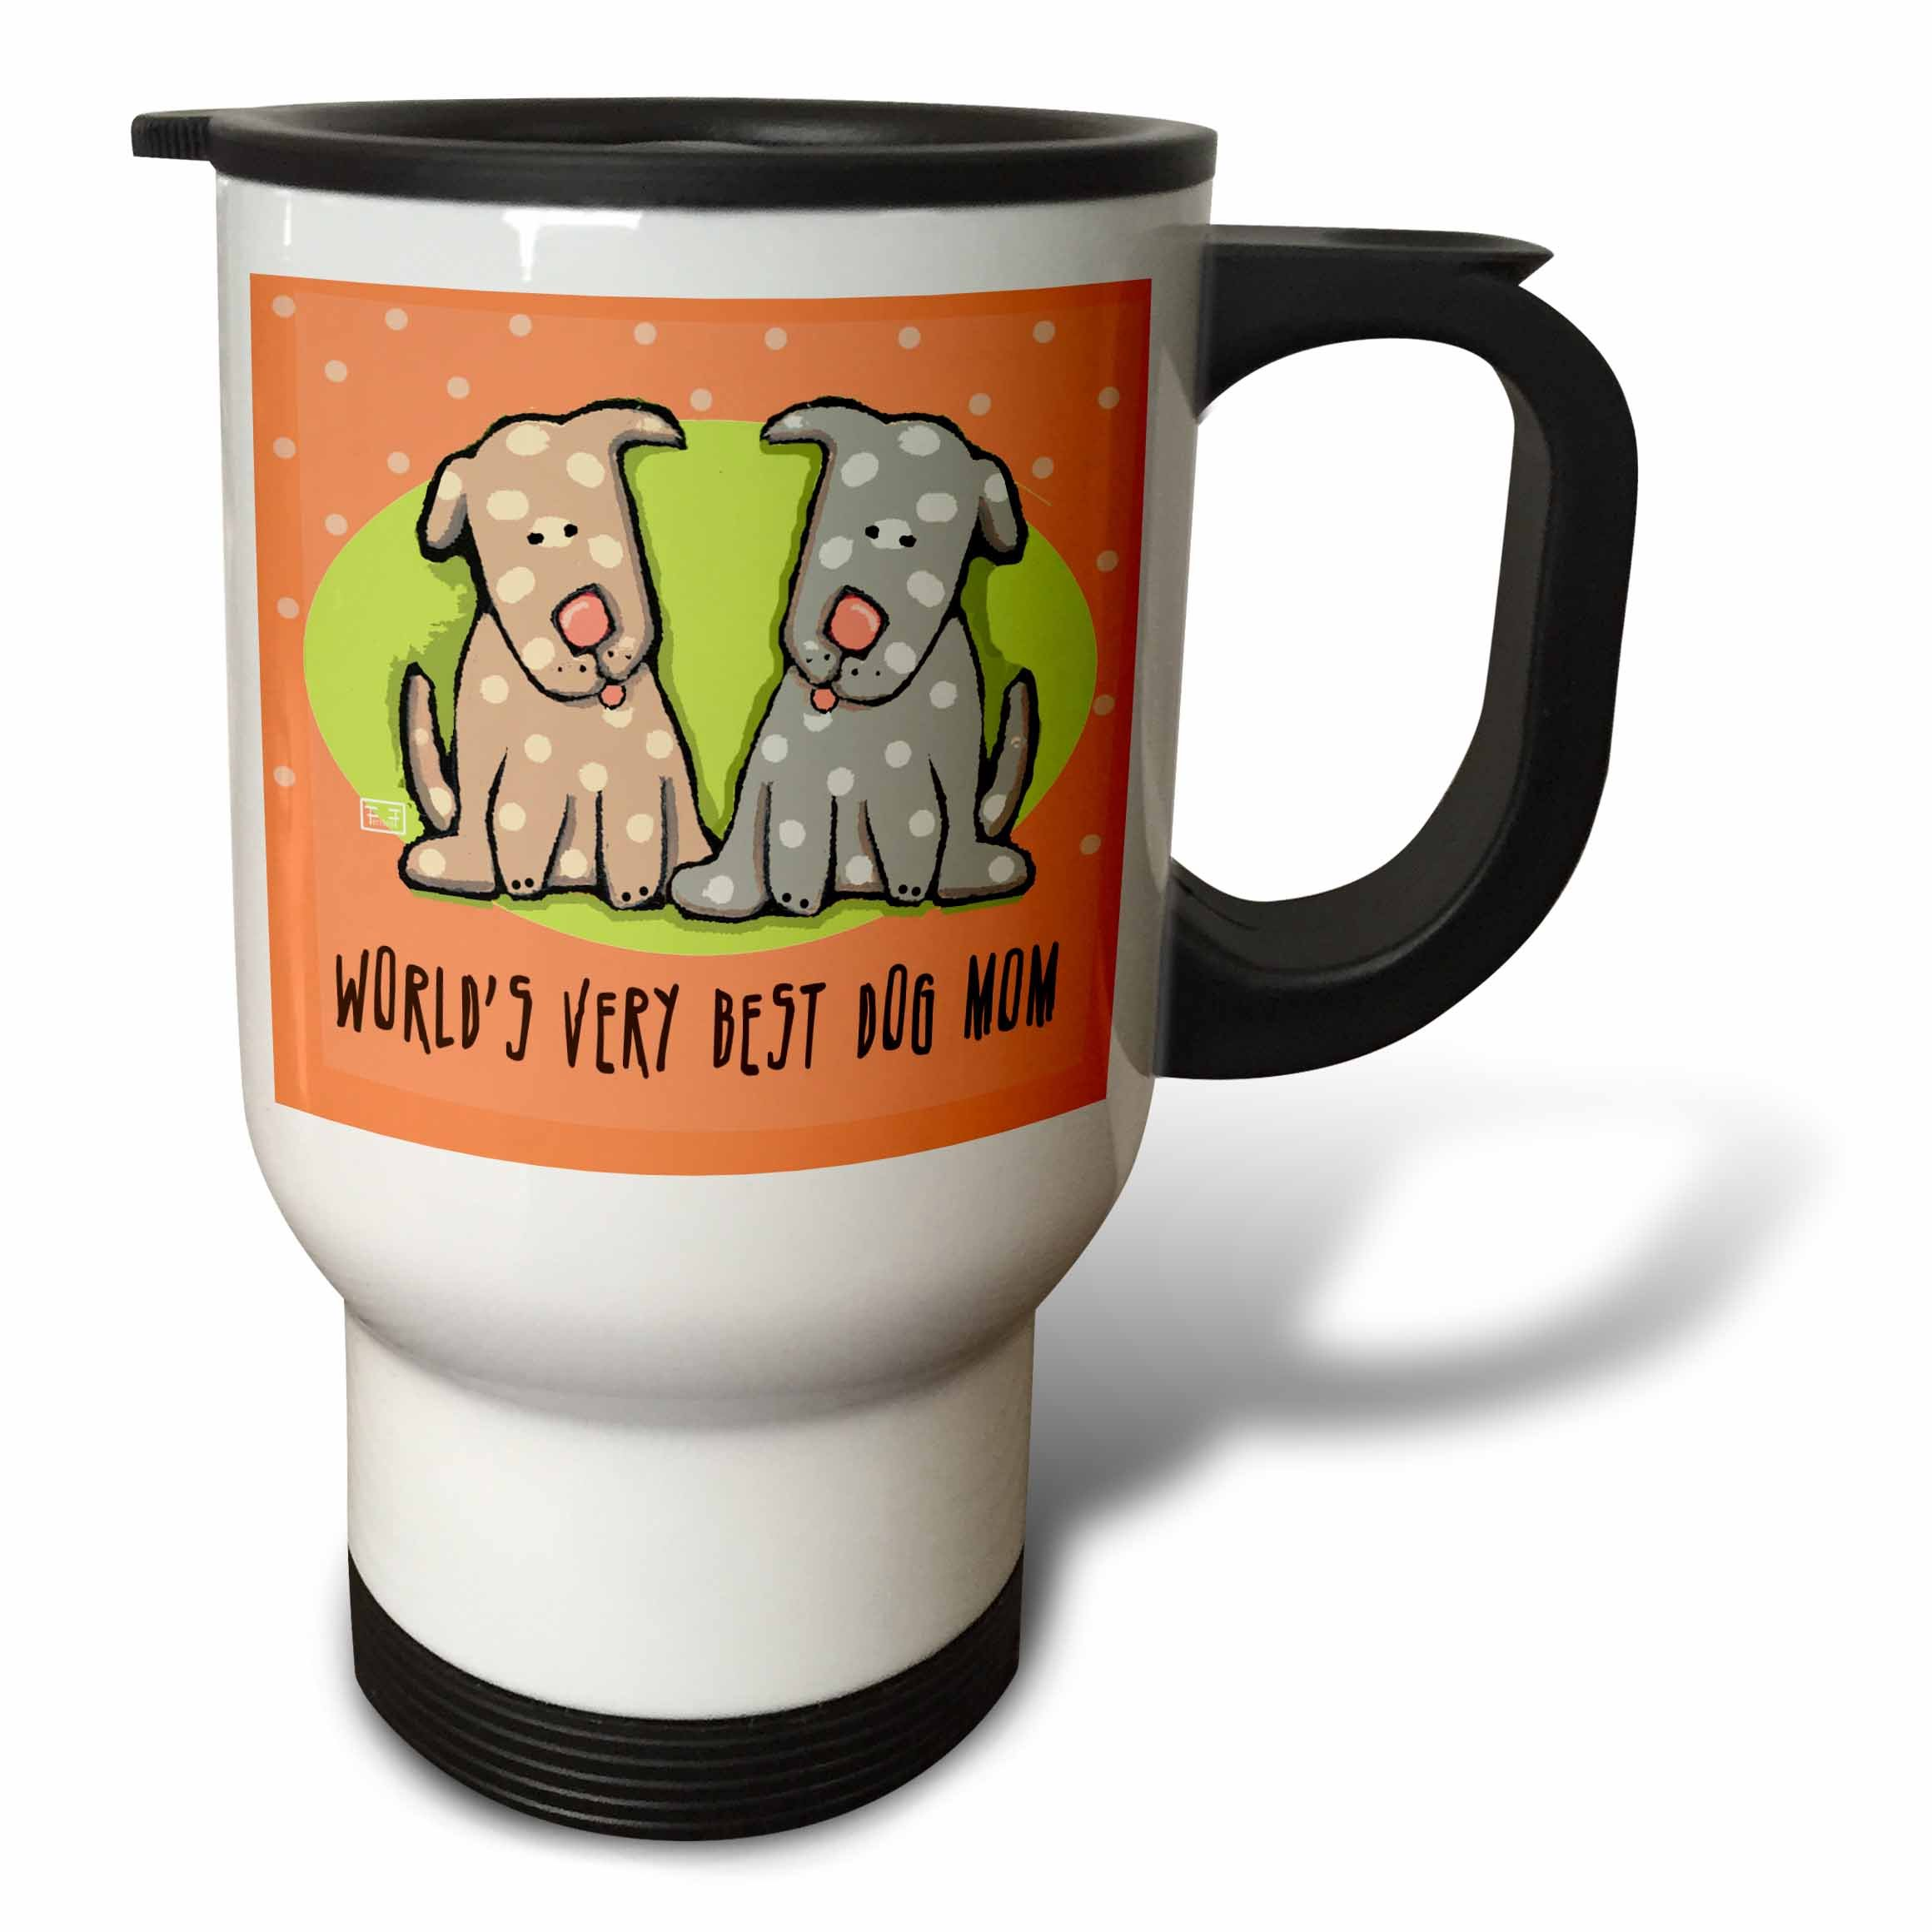 3dRose World's Best Dog Mom Cute Cartoon Puppies Pets Animals Travel Mug, 14-Ounce, Stainless Steel